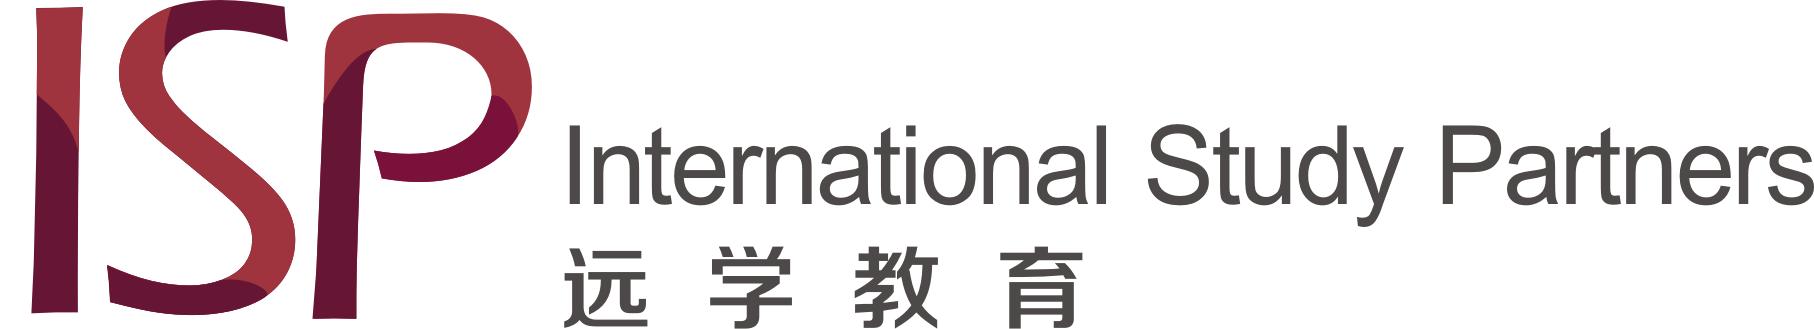 International Study Partners logo